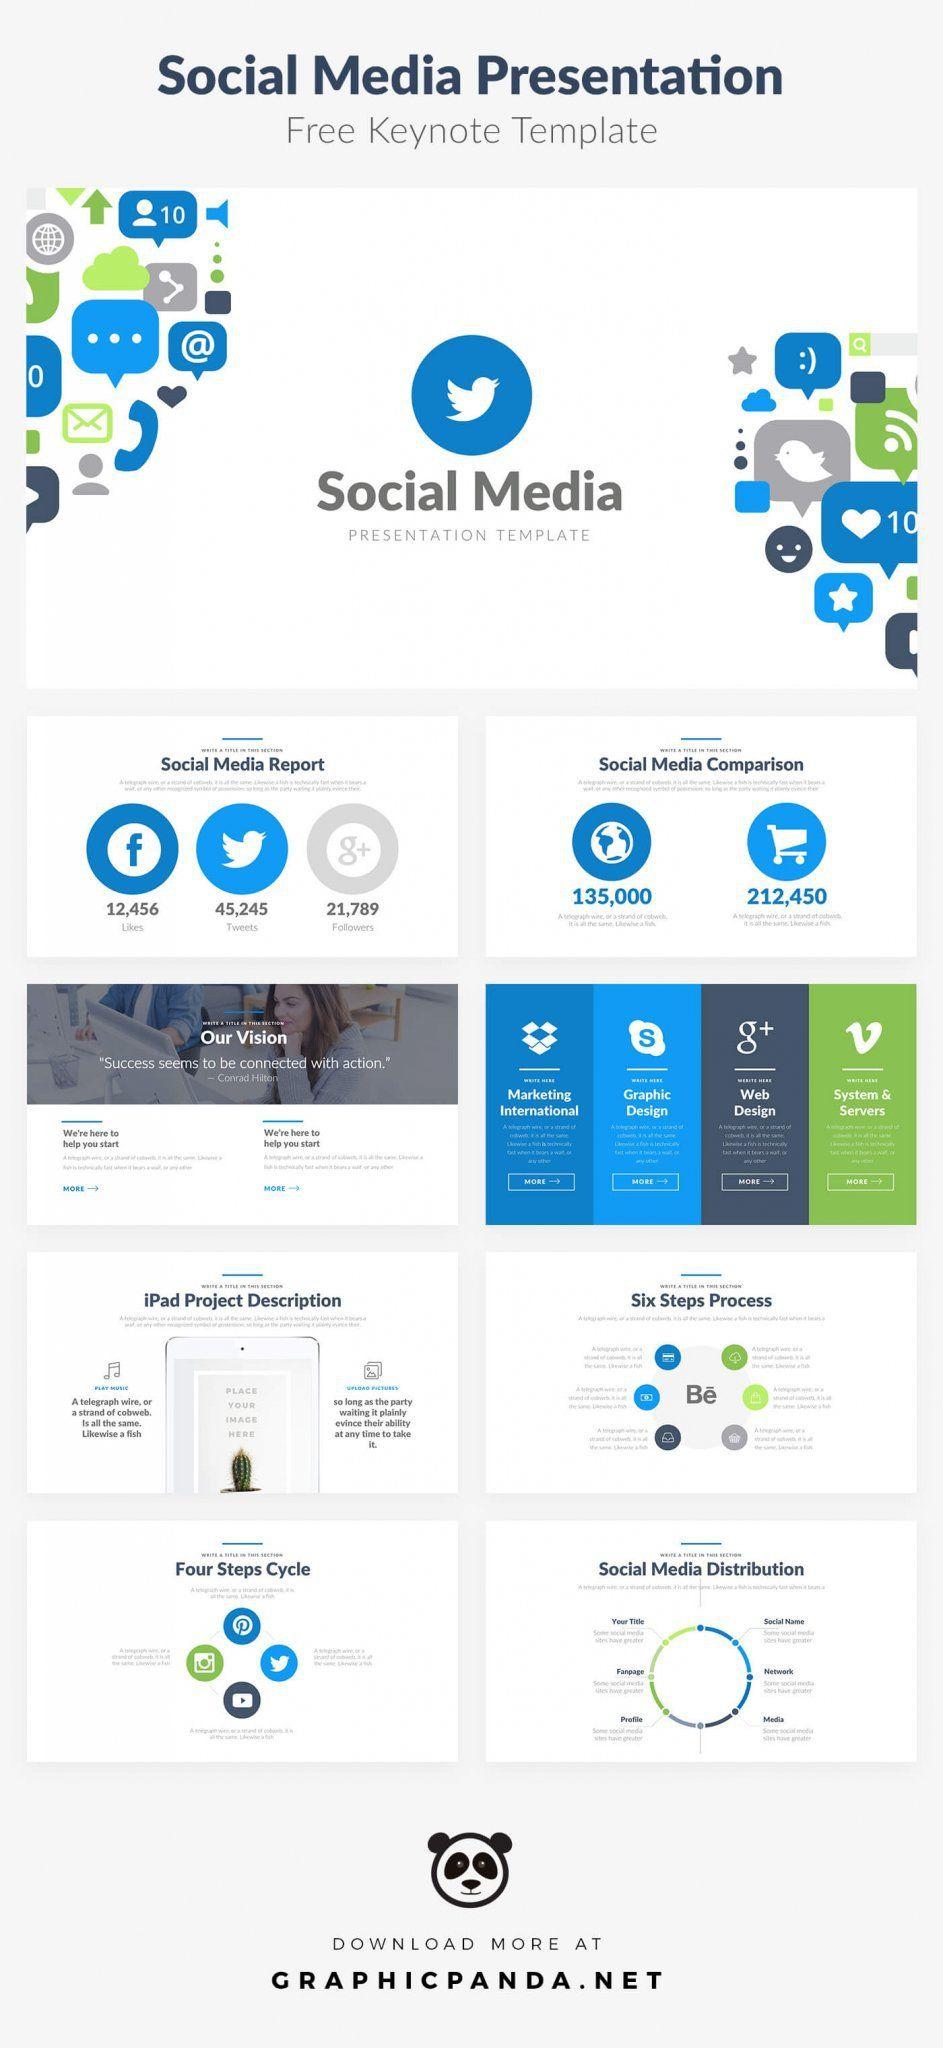 Free Social Media Keynote Template | Free Keynote Templates ...